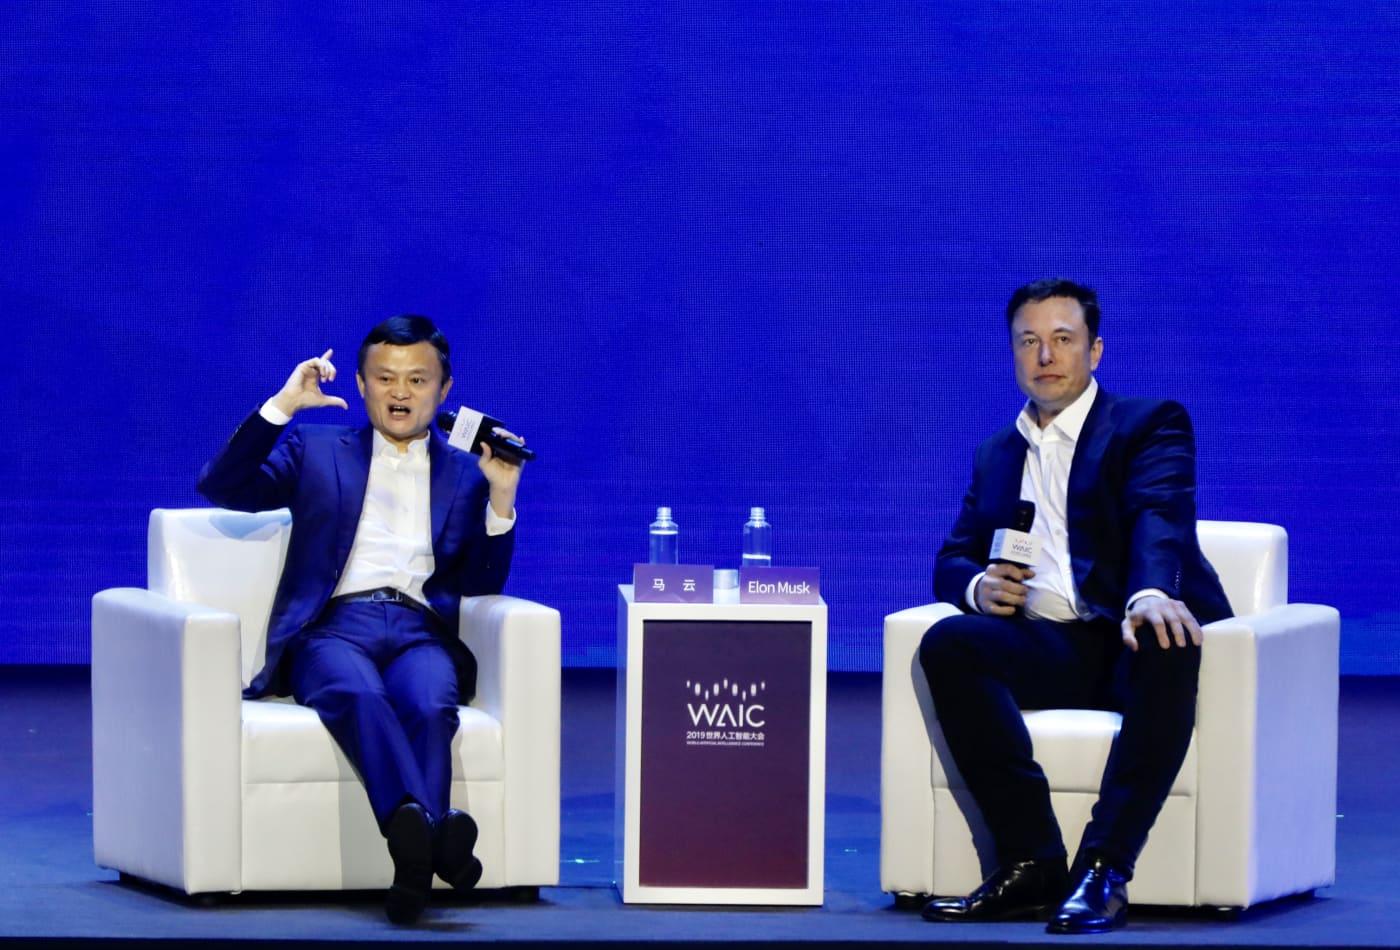 Elon Musk, Jack Ma: Biggest problem world will face is population drop